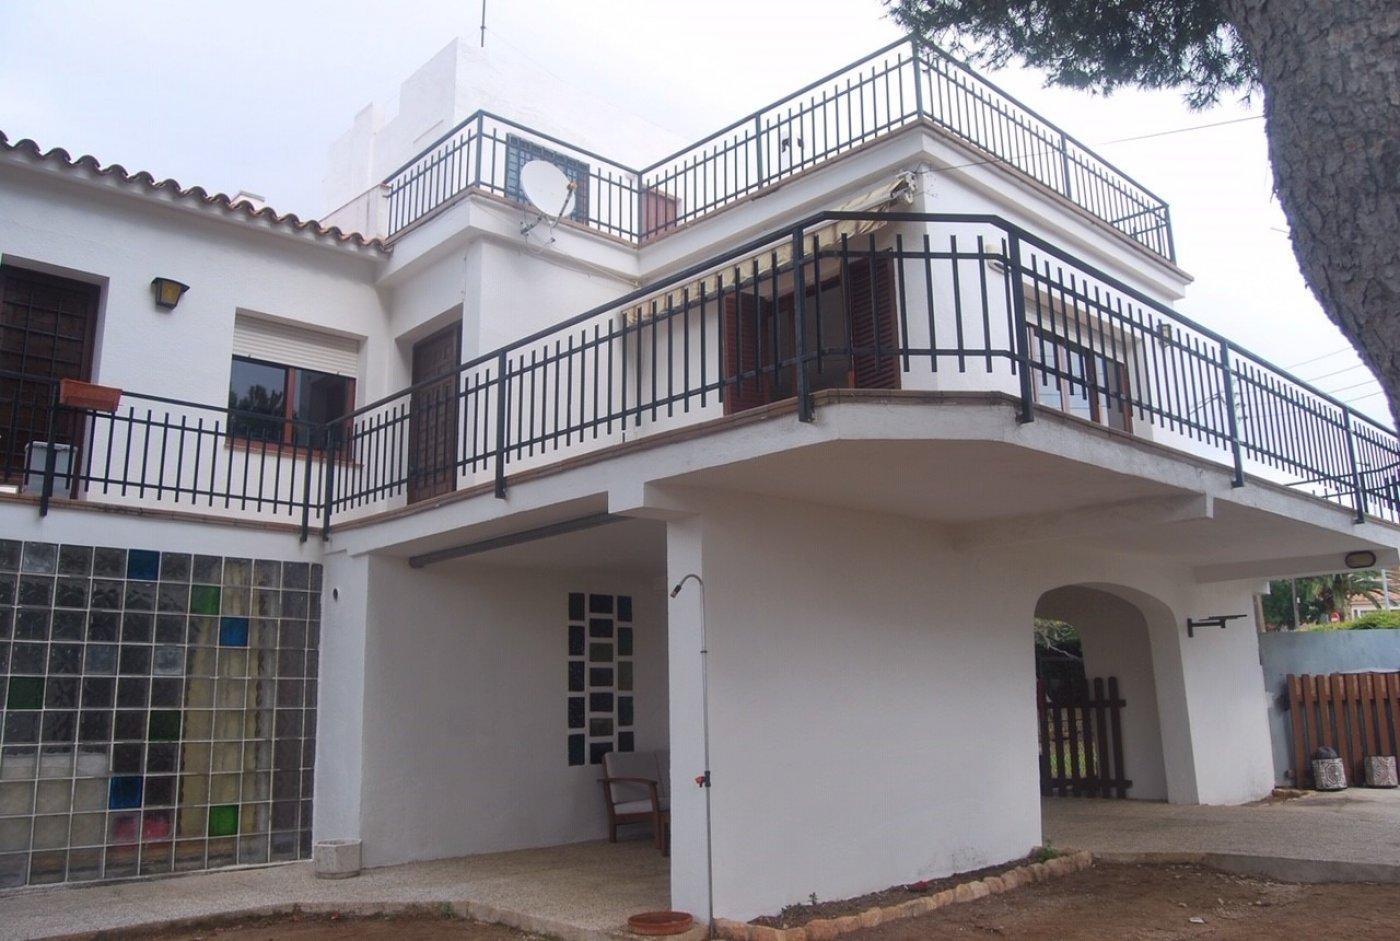 Fantástica casa en els munts de torredembarra - imagenInmueble0